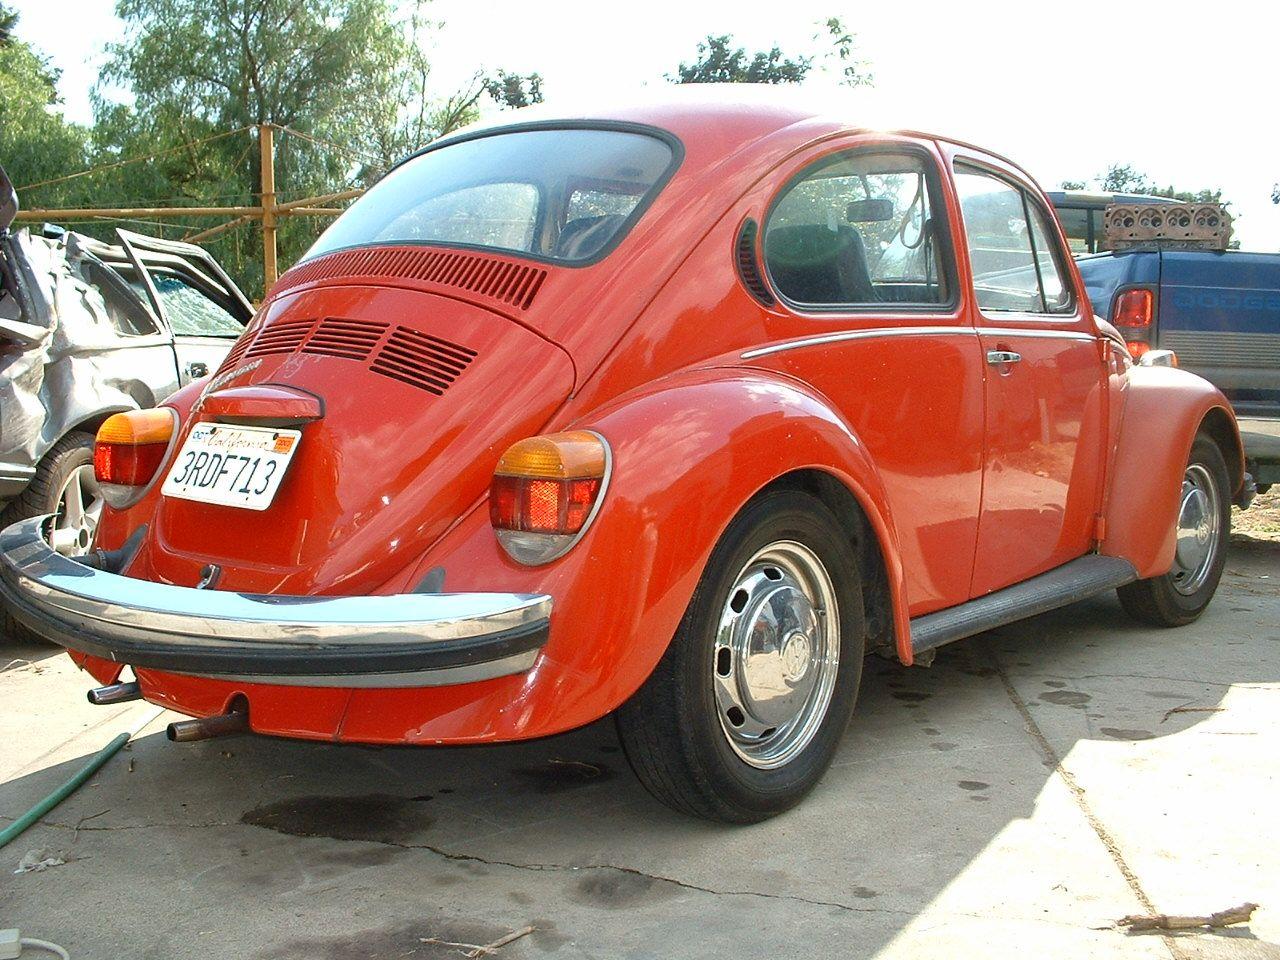 Http img51 imageshack us img51 3378 dsc01748j jpg l456 ruby red vw red pinterest ruby red beetles and vw beetles